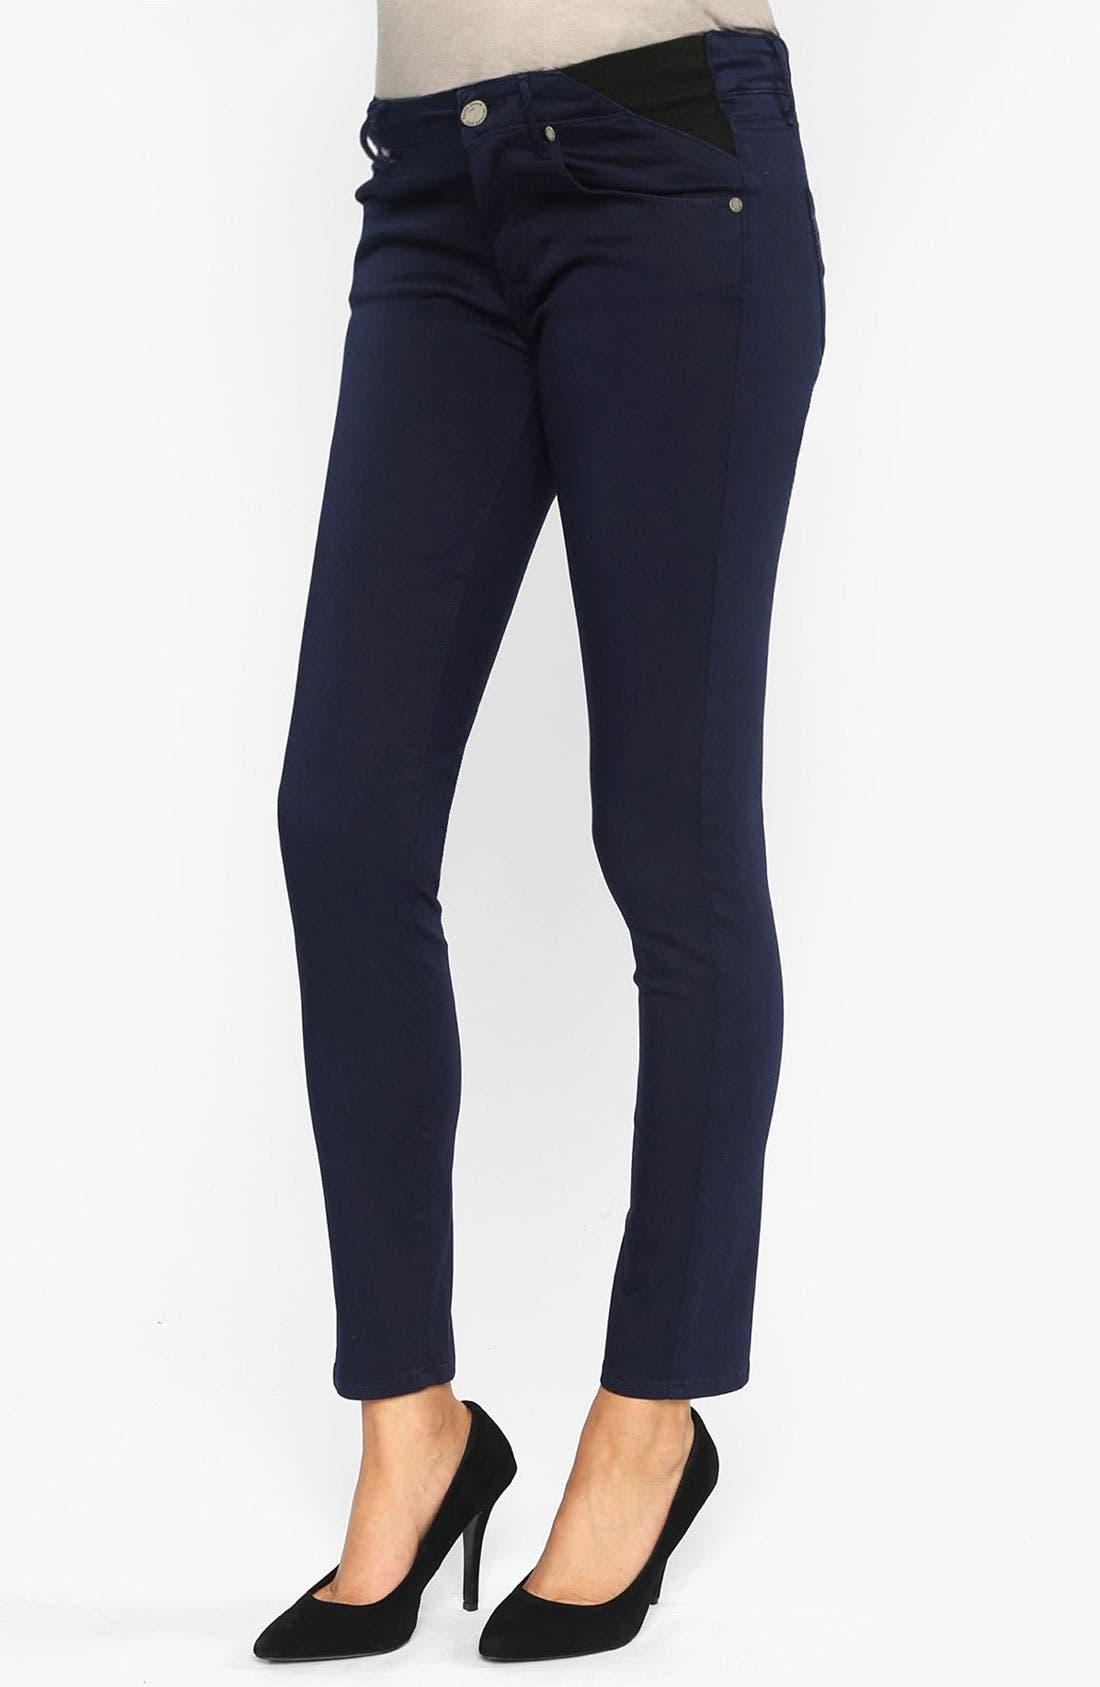 Main Image - Paige Denim 'Verdugo' Maternity Ankle Ultra Skinny Jeans (Pacific Dusk)